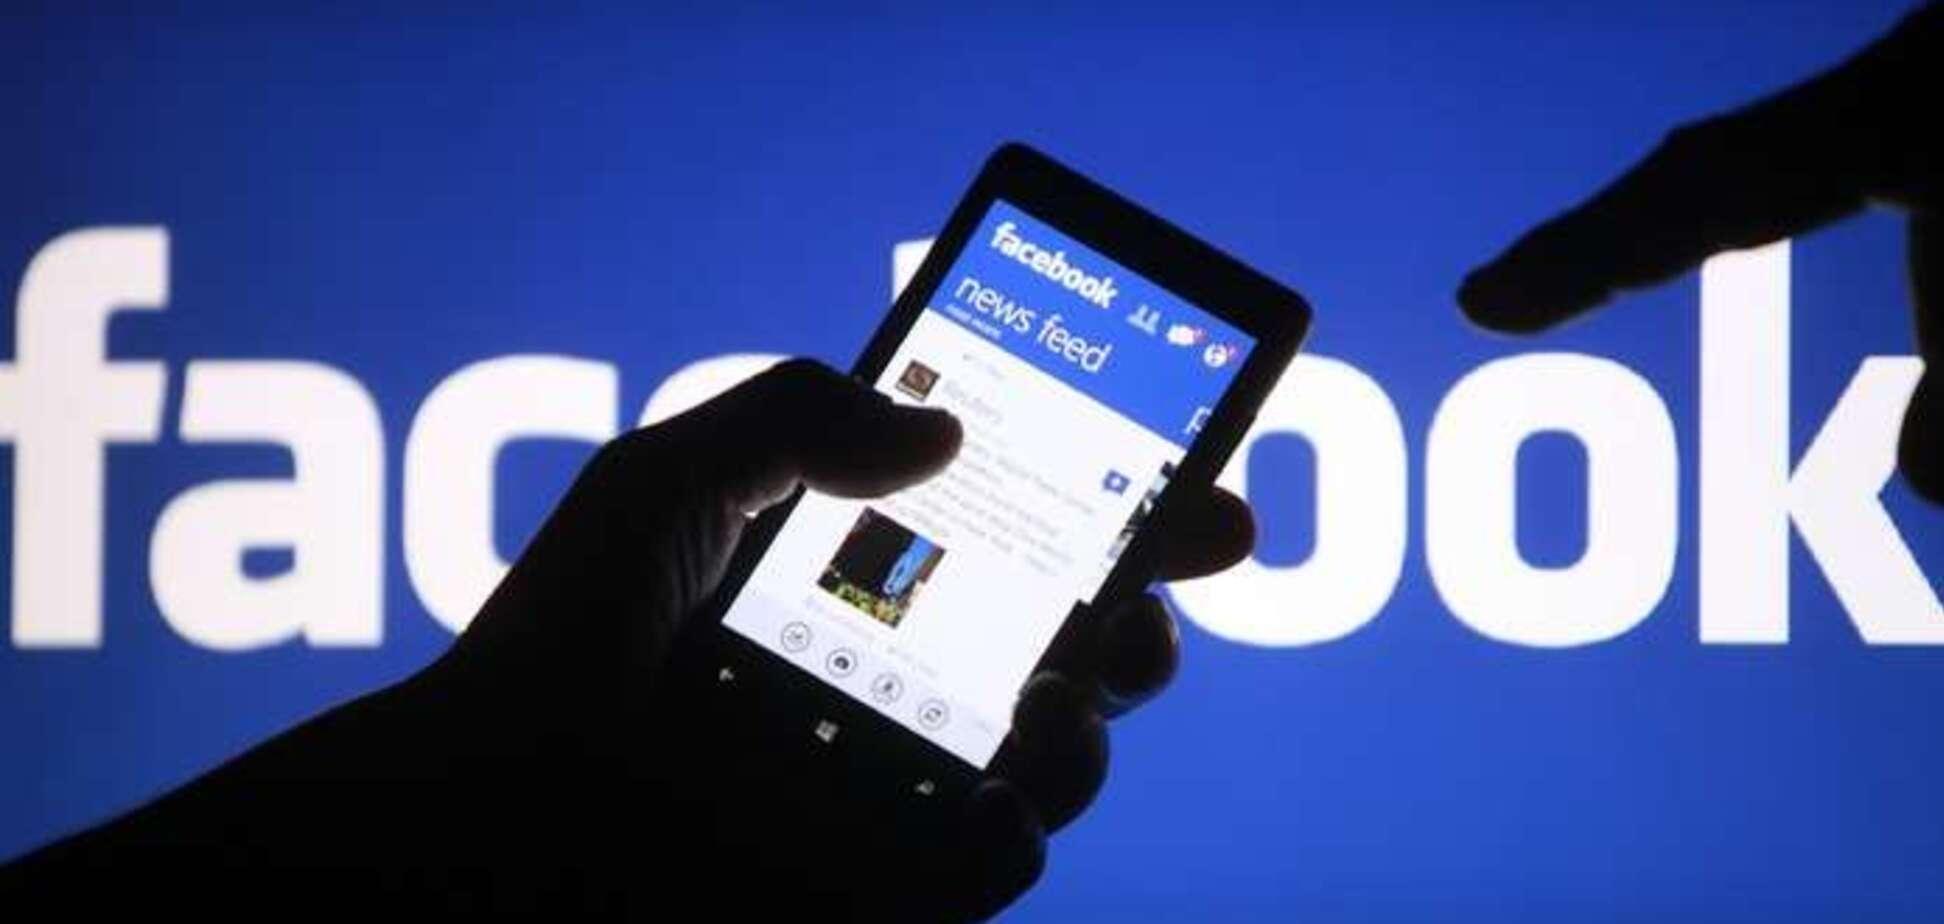 'Л/ДНР' - терористи! Україна звернулася до Facebook із важливим закликом